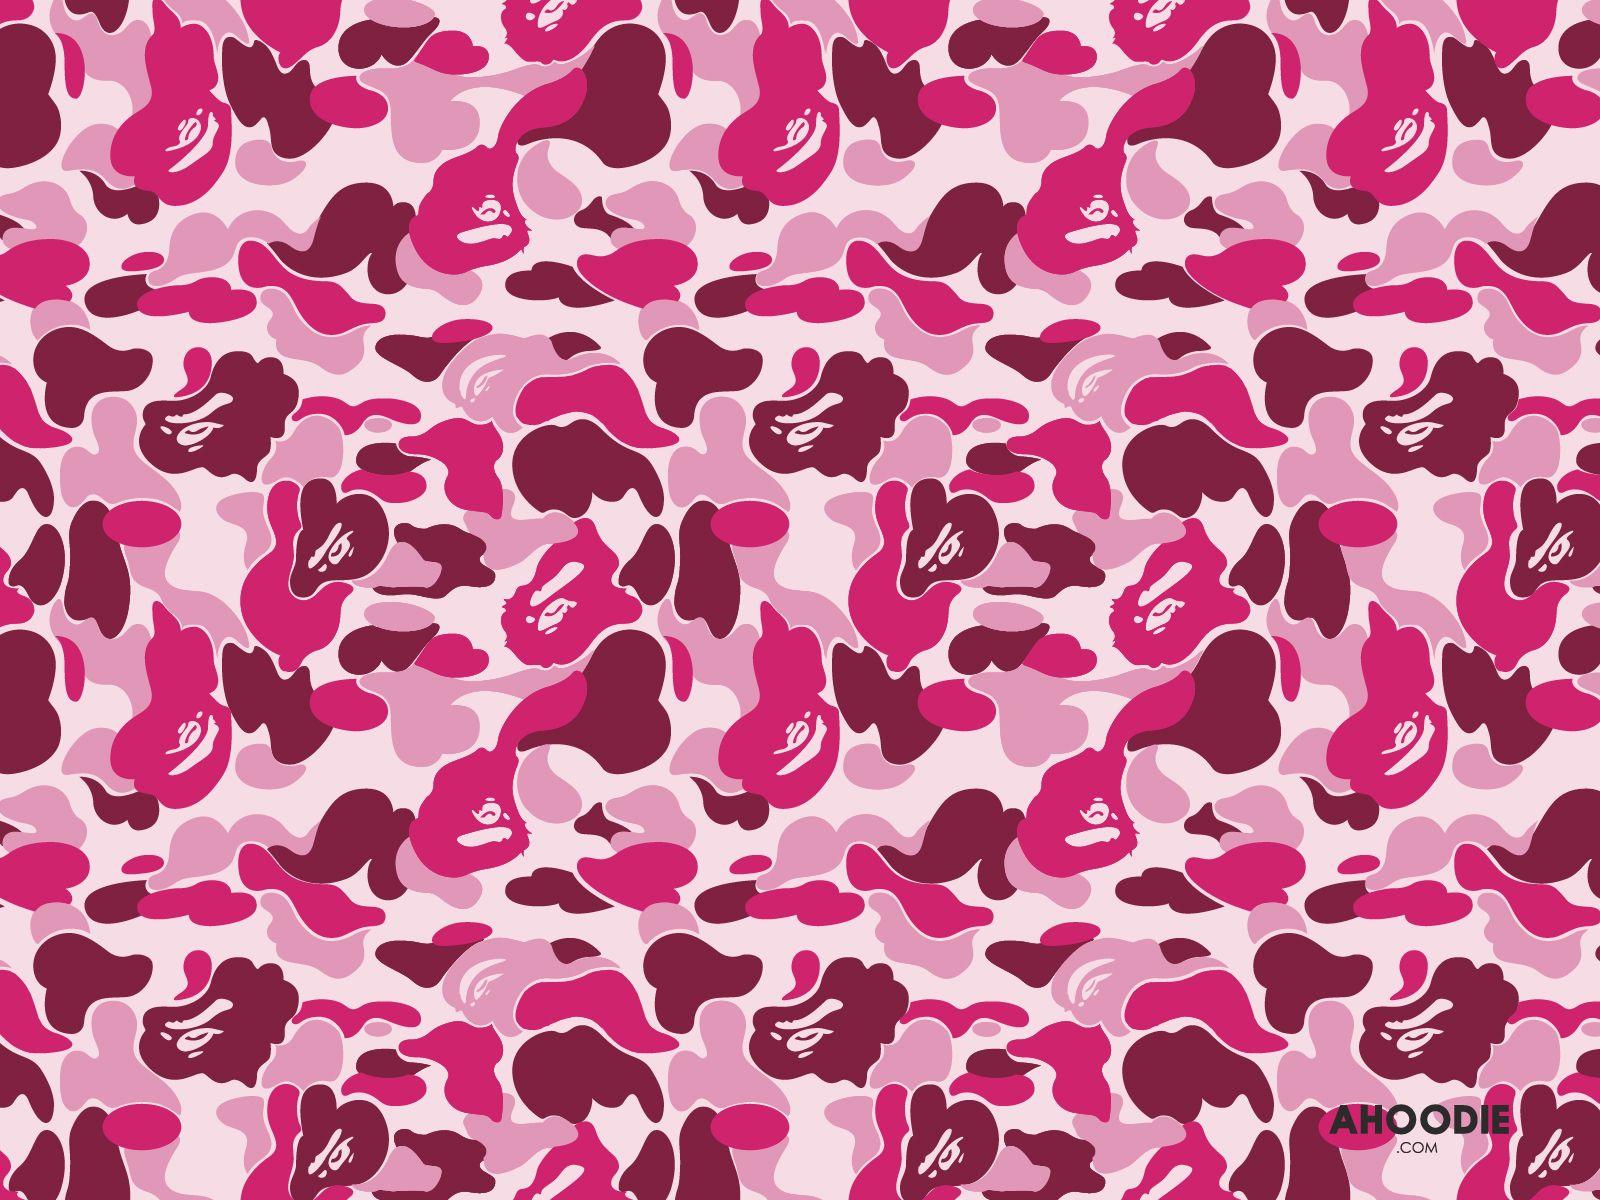 bape-camo-wallpaper-desktop_pink.jpg (1600×1200) | ㄹㄹ ...